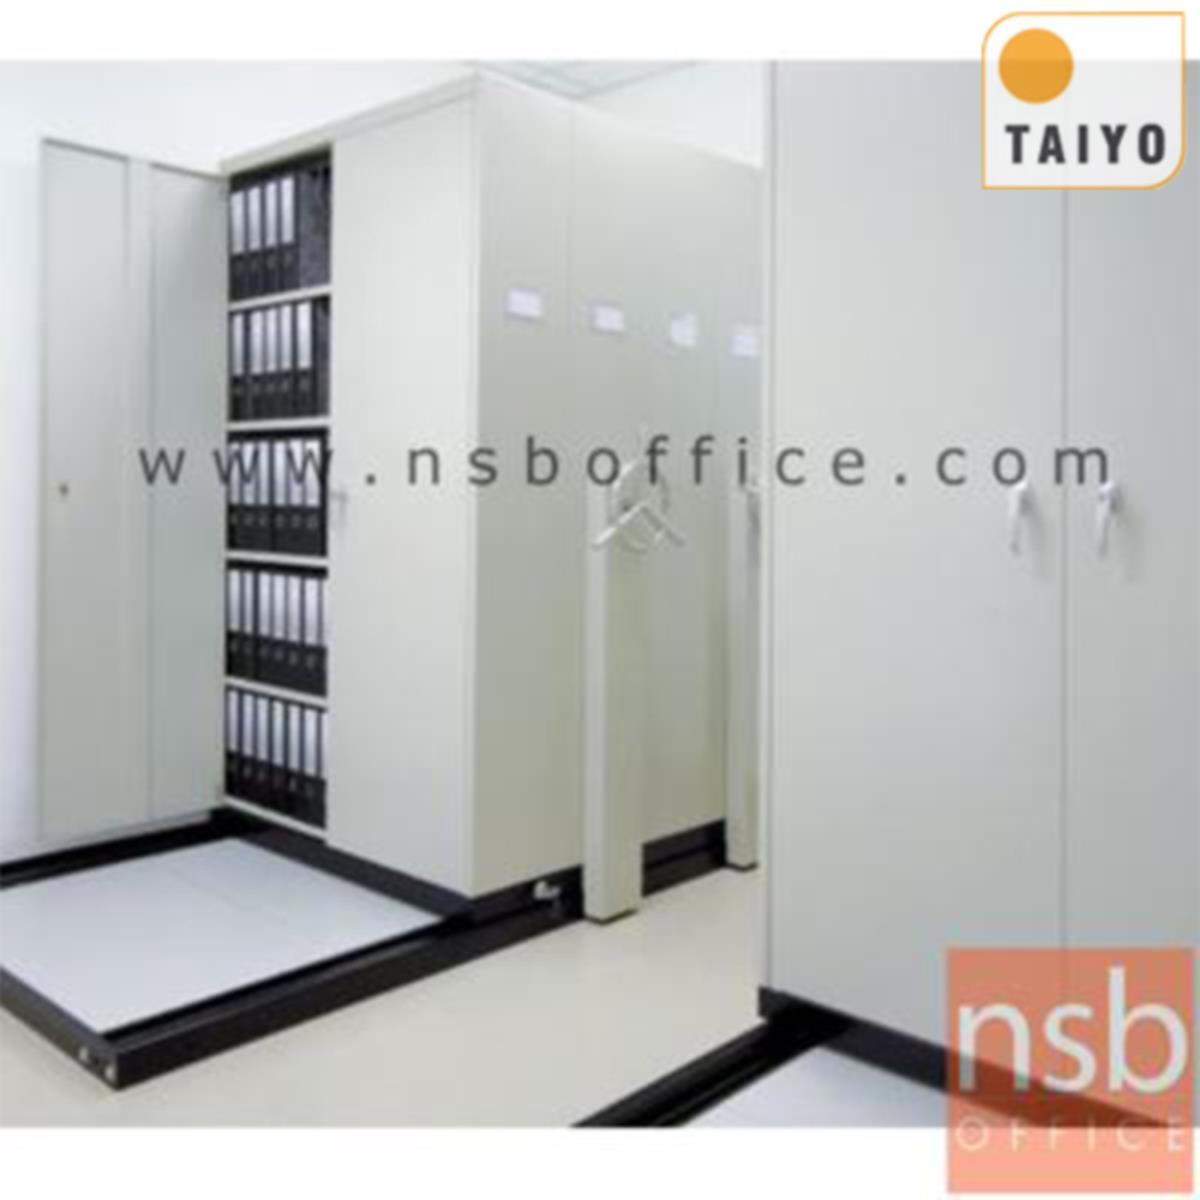 D02A006:ตู้รางเลื่อนแบบพวงมาลัย 1 ตอน  TAIYO-GT มอก. 1496-2541 ขนาด 5, 7, 9 ตู้